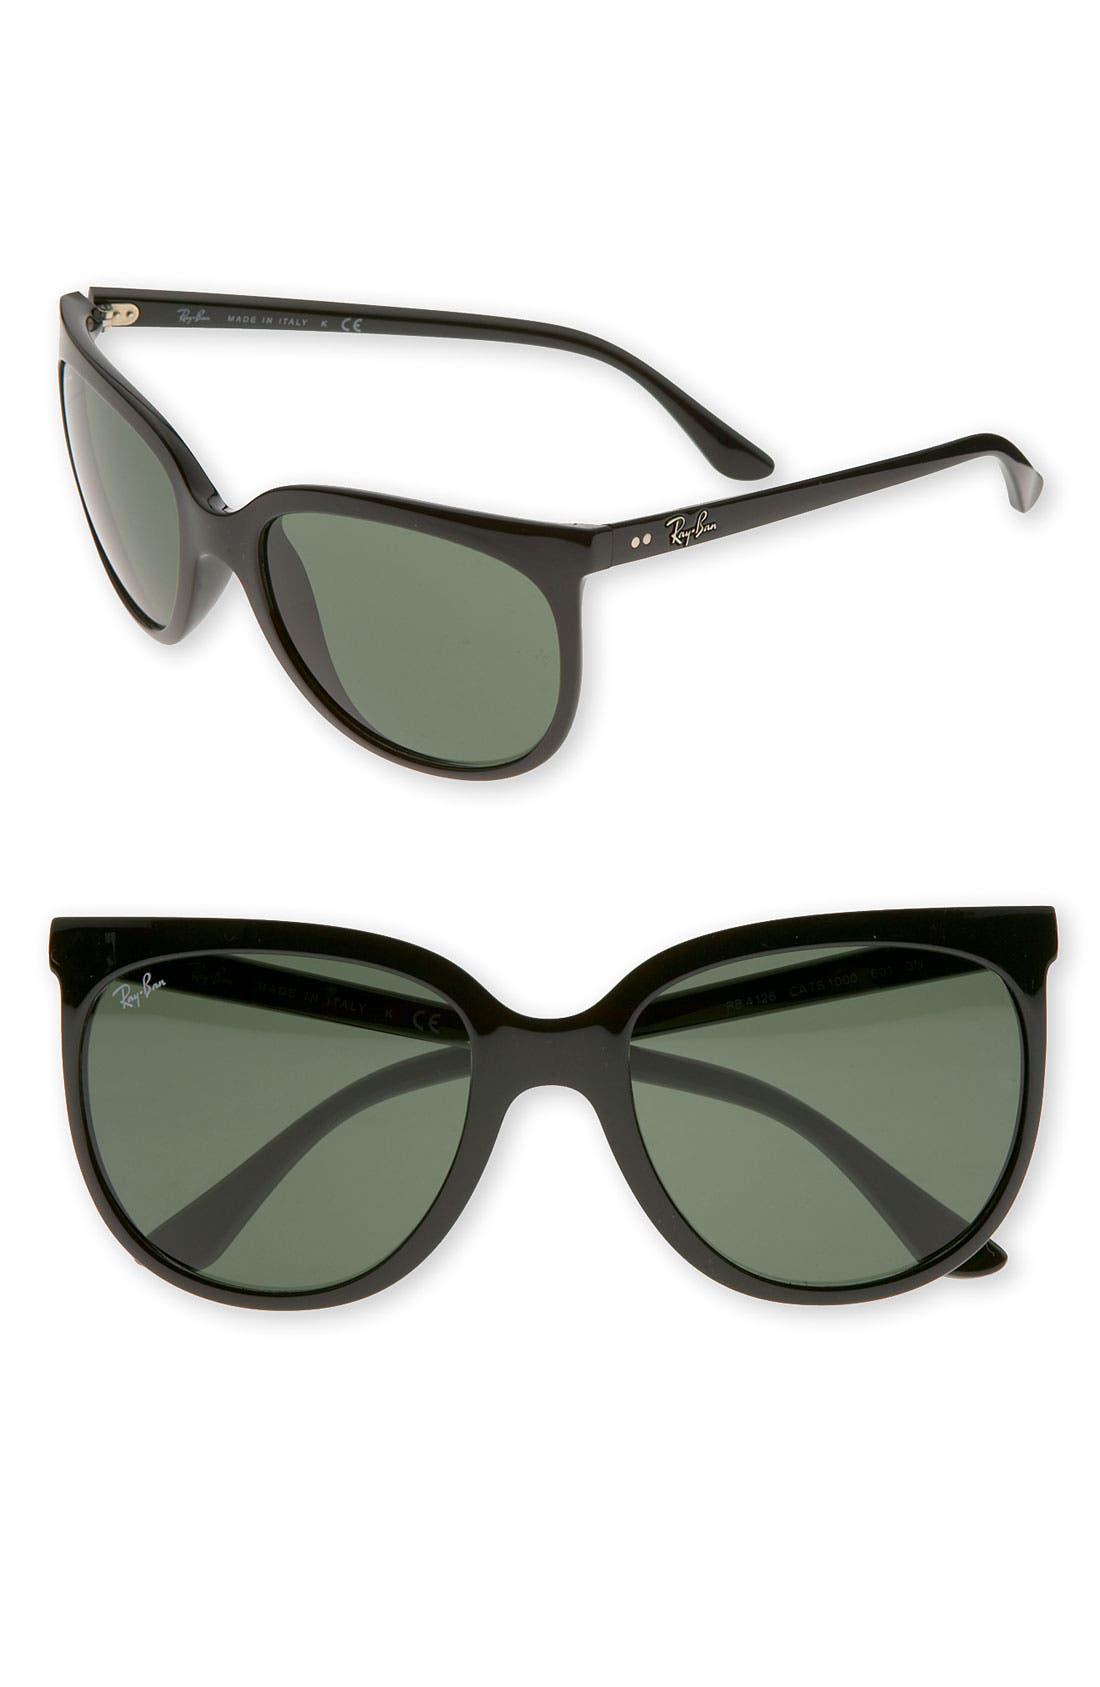 Retro Cat Eye Sunglasses,                             Main thumbnail 1, color,                             001